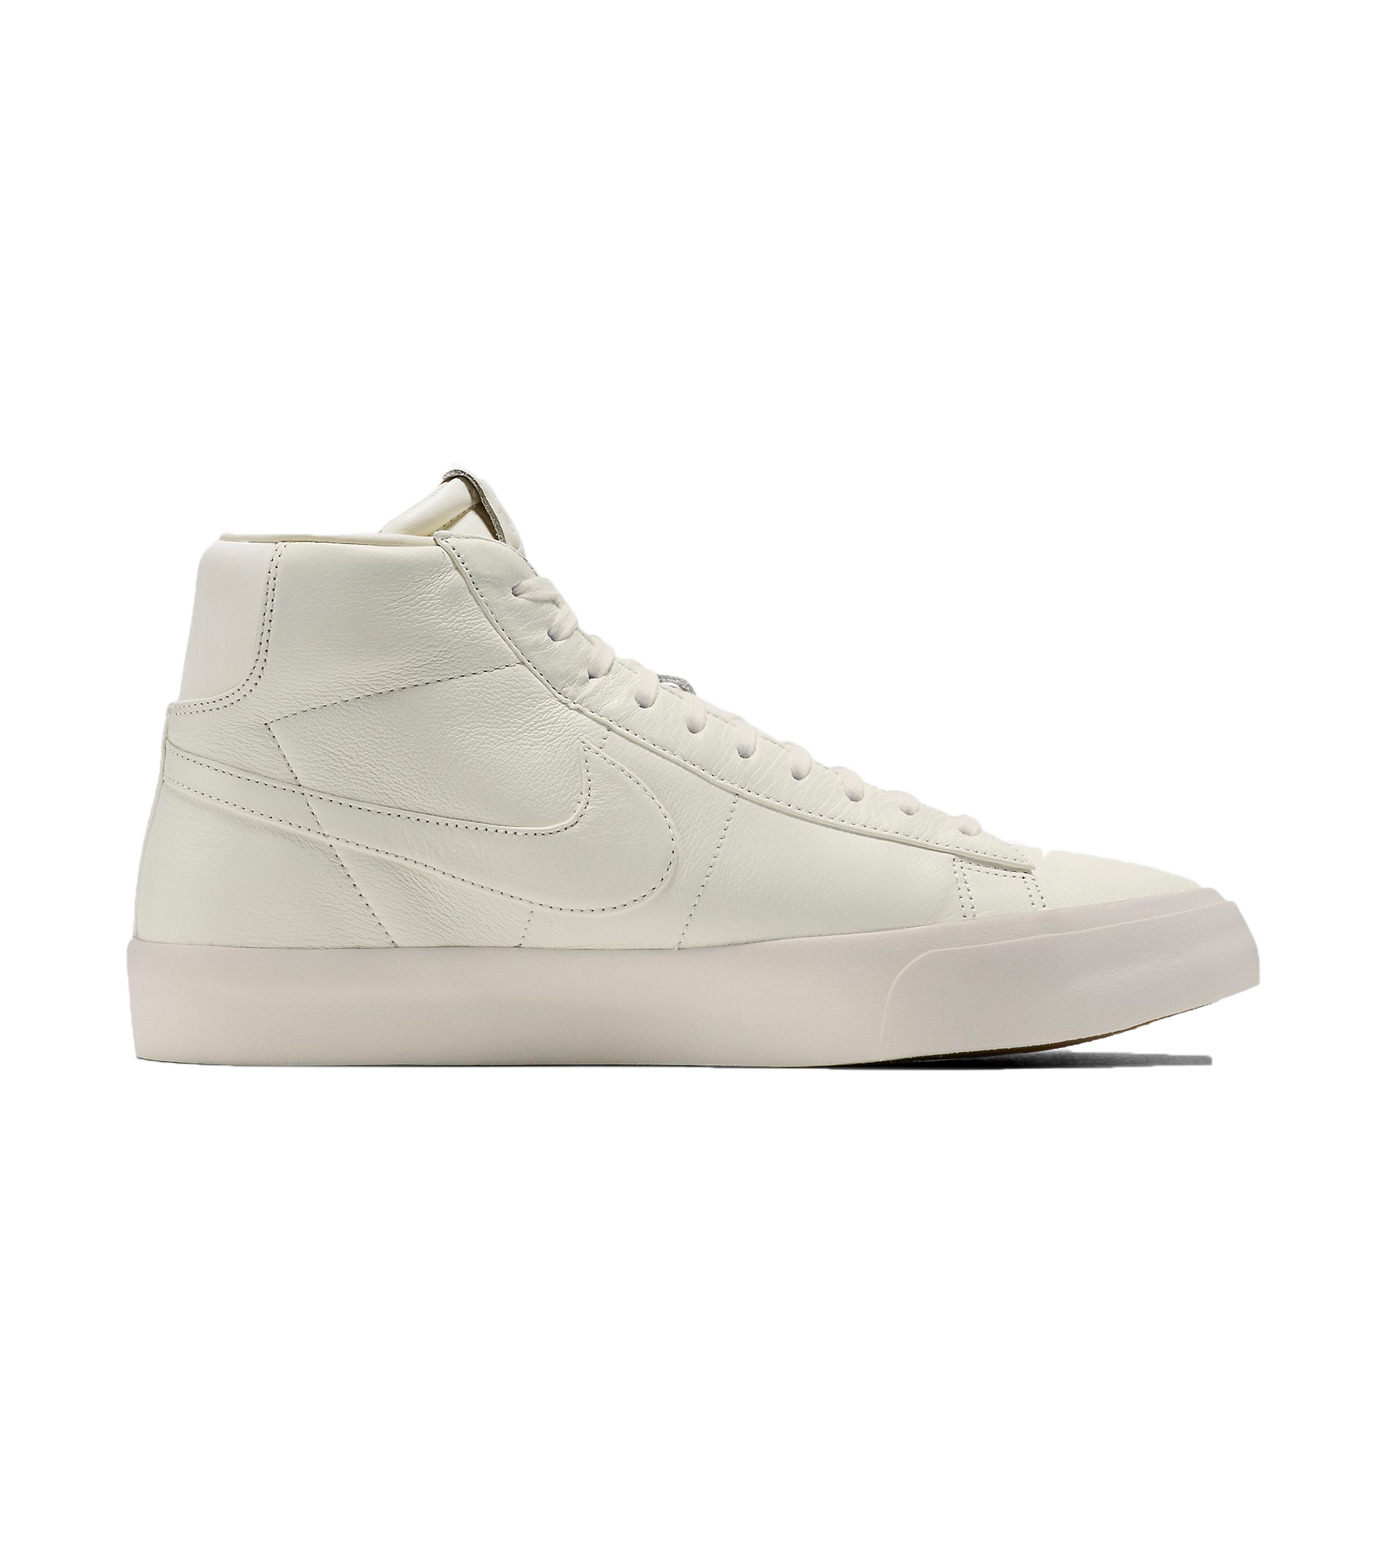 NIKE(ナイキ)のBLAZER STUDIO MID-WHITE(シューズ/shoes)-904805-100-4 拡大詳細画像1